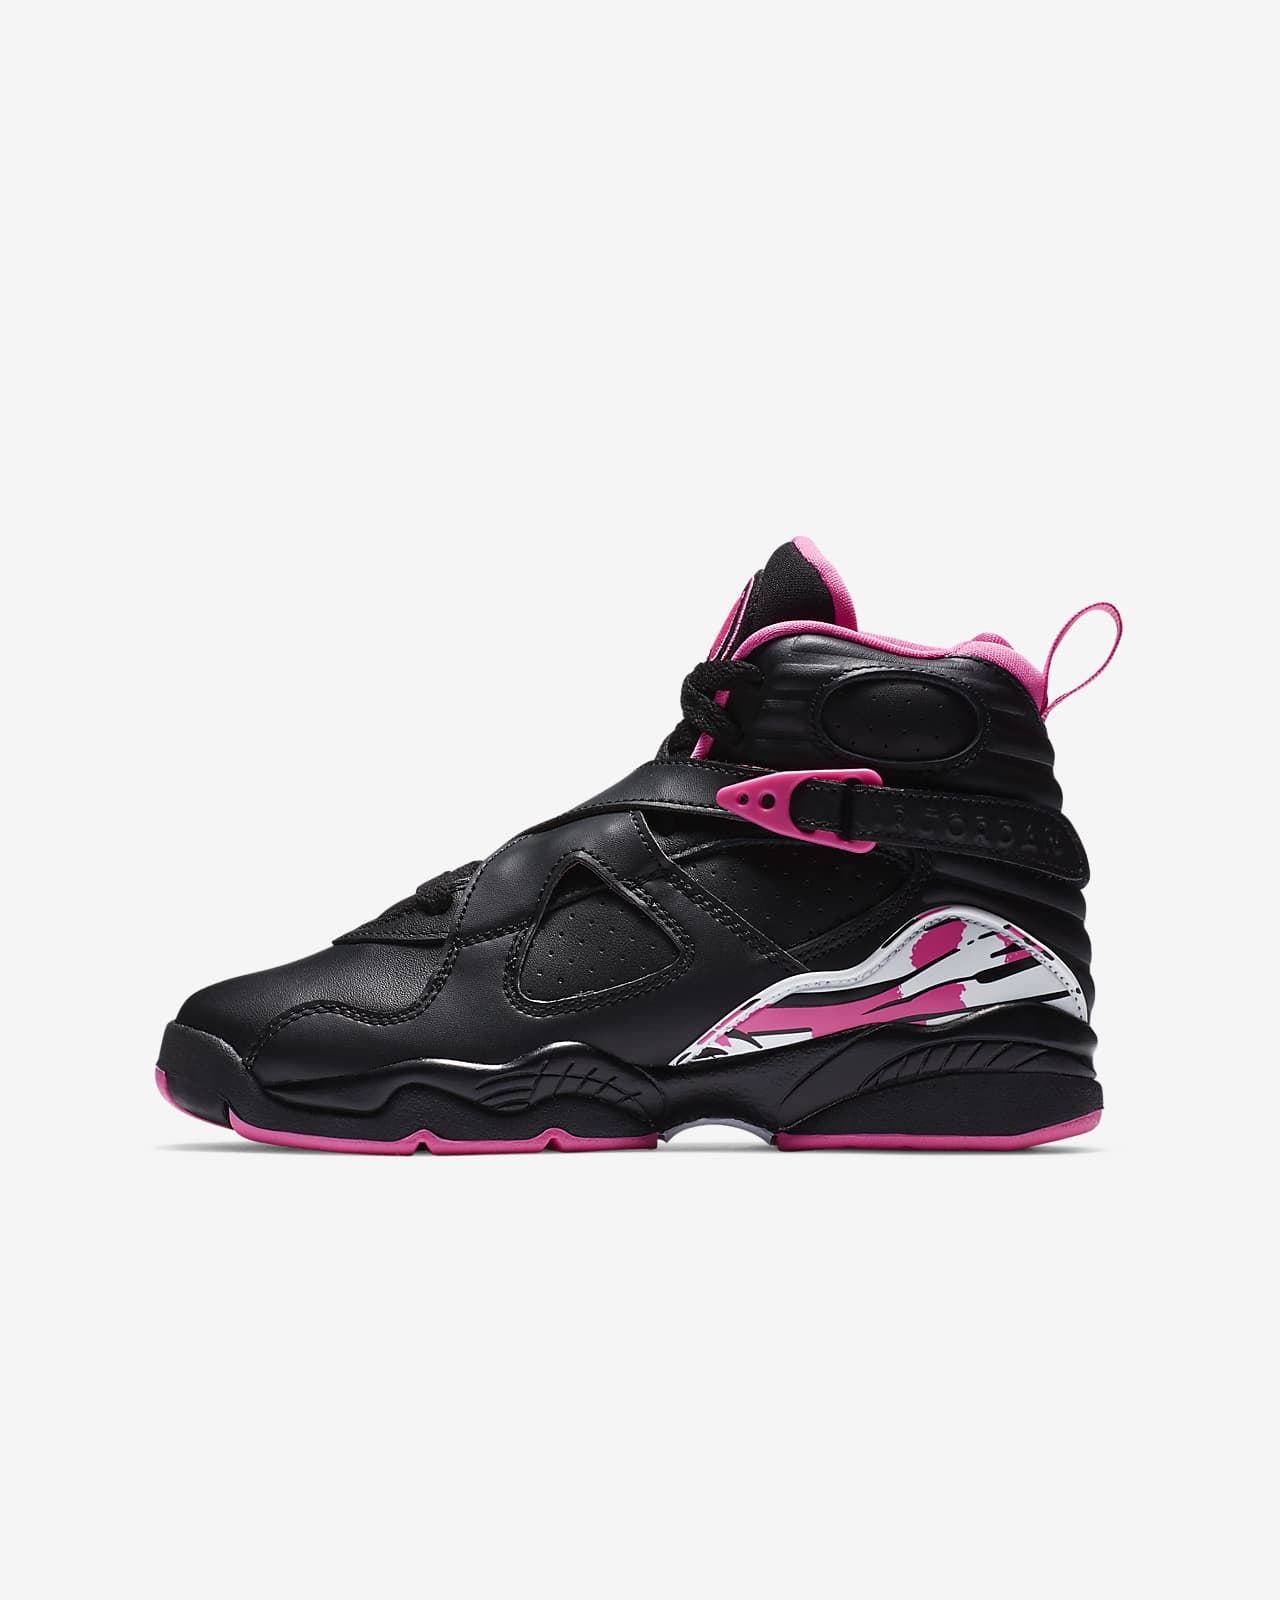 Air Jordan 8 Retro-sko til store børn